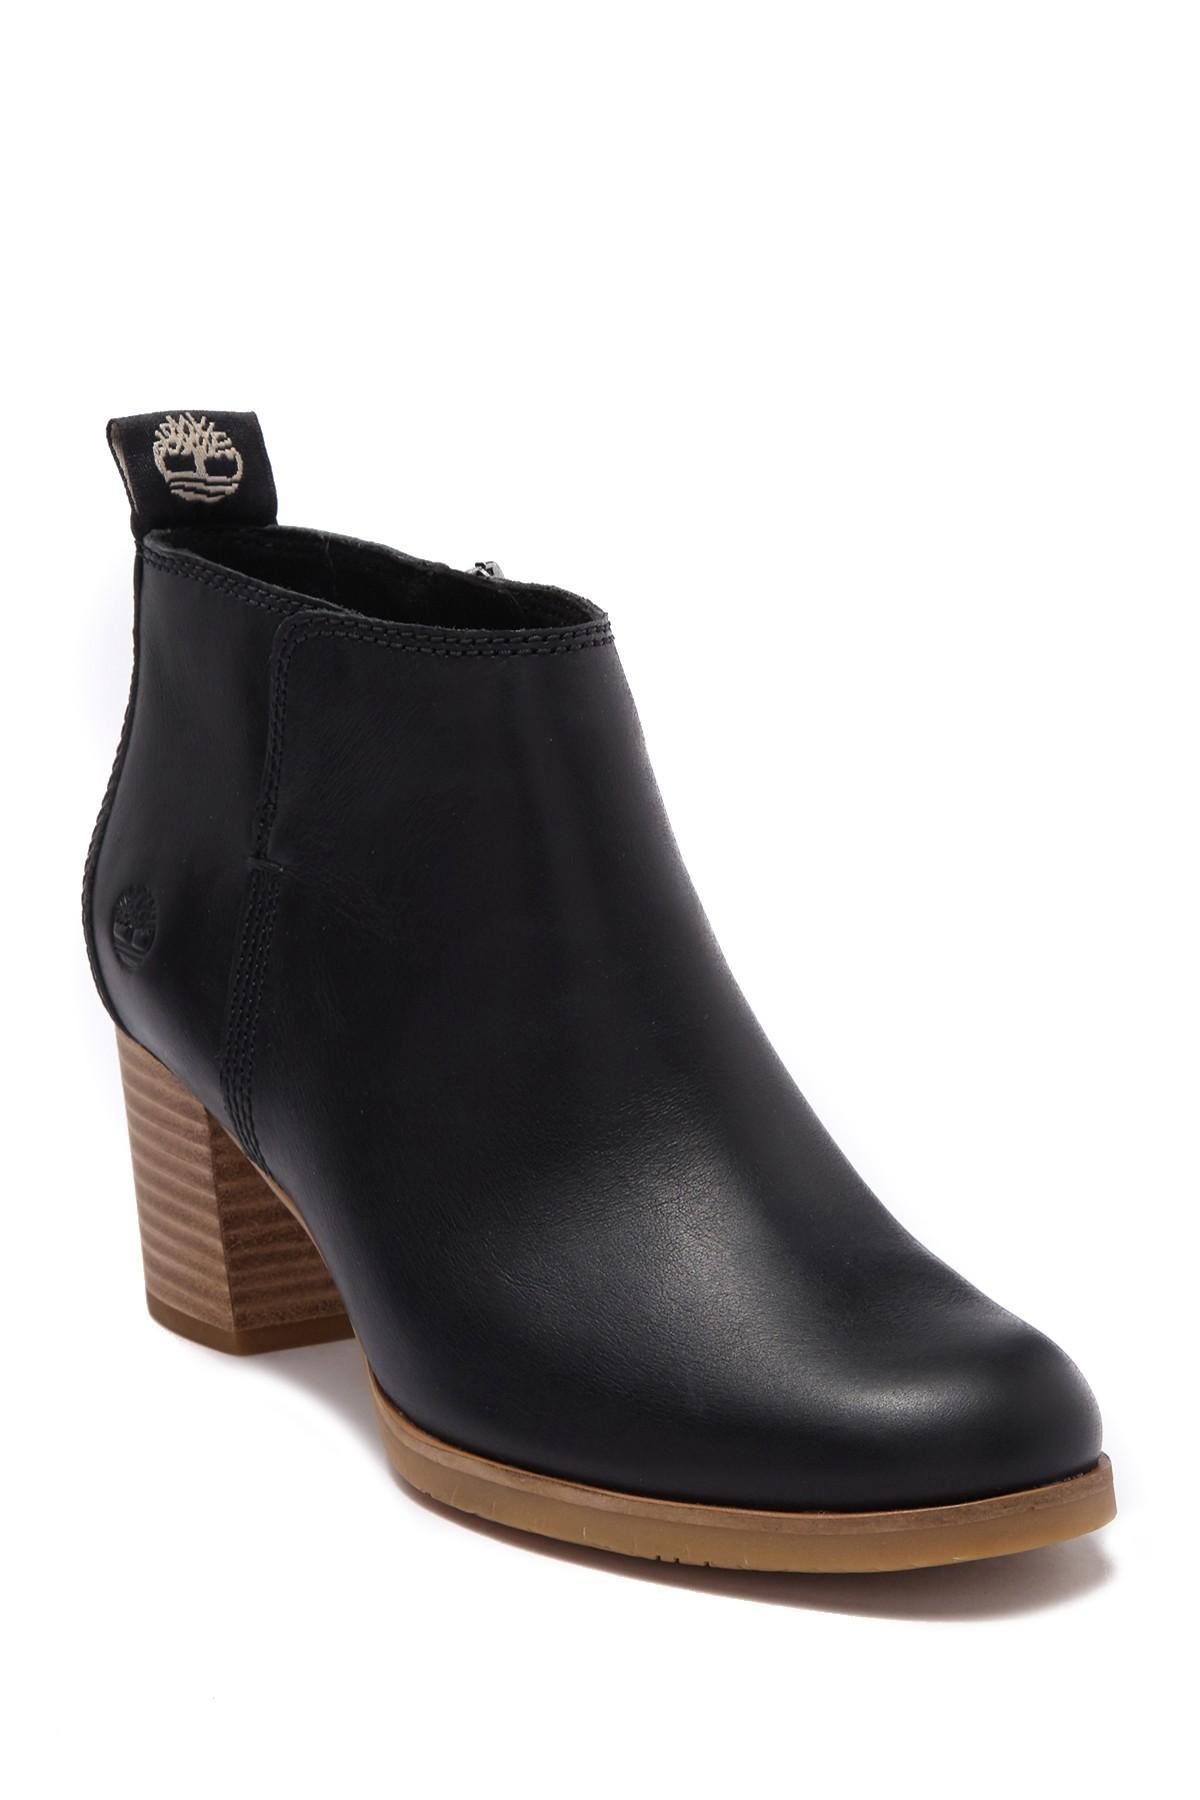 Eleonor Street Ankle Boot in Black